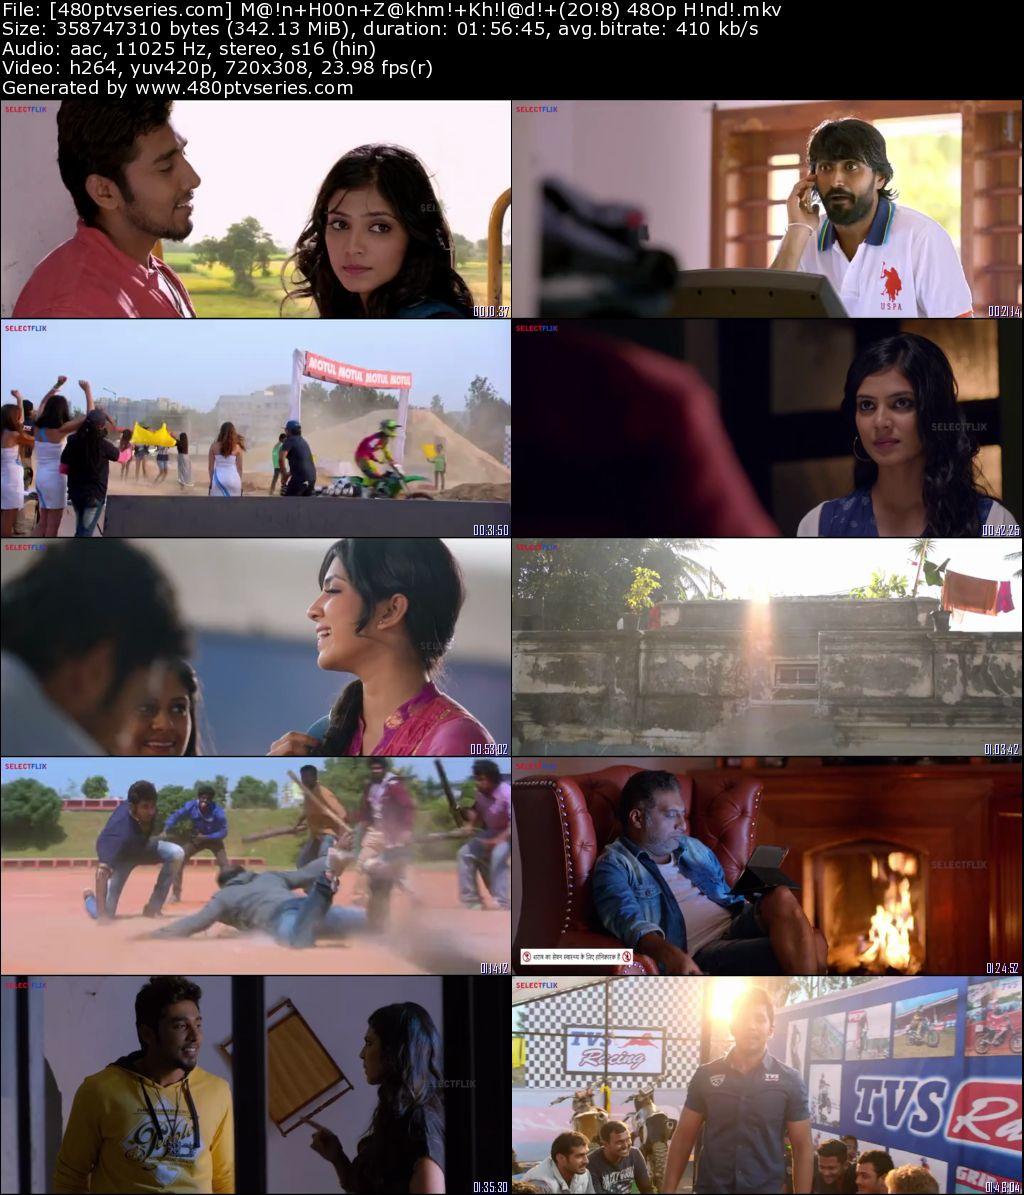 Main Hoon Zakhmi Khiladi (2018) 300MB Full Hindi Dubbed Movie Download 480p HDRip Free Watch Online Full Movie Download Worldfree4u 9xmovies